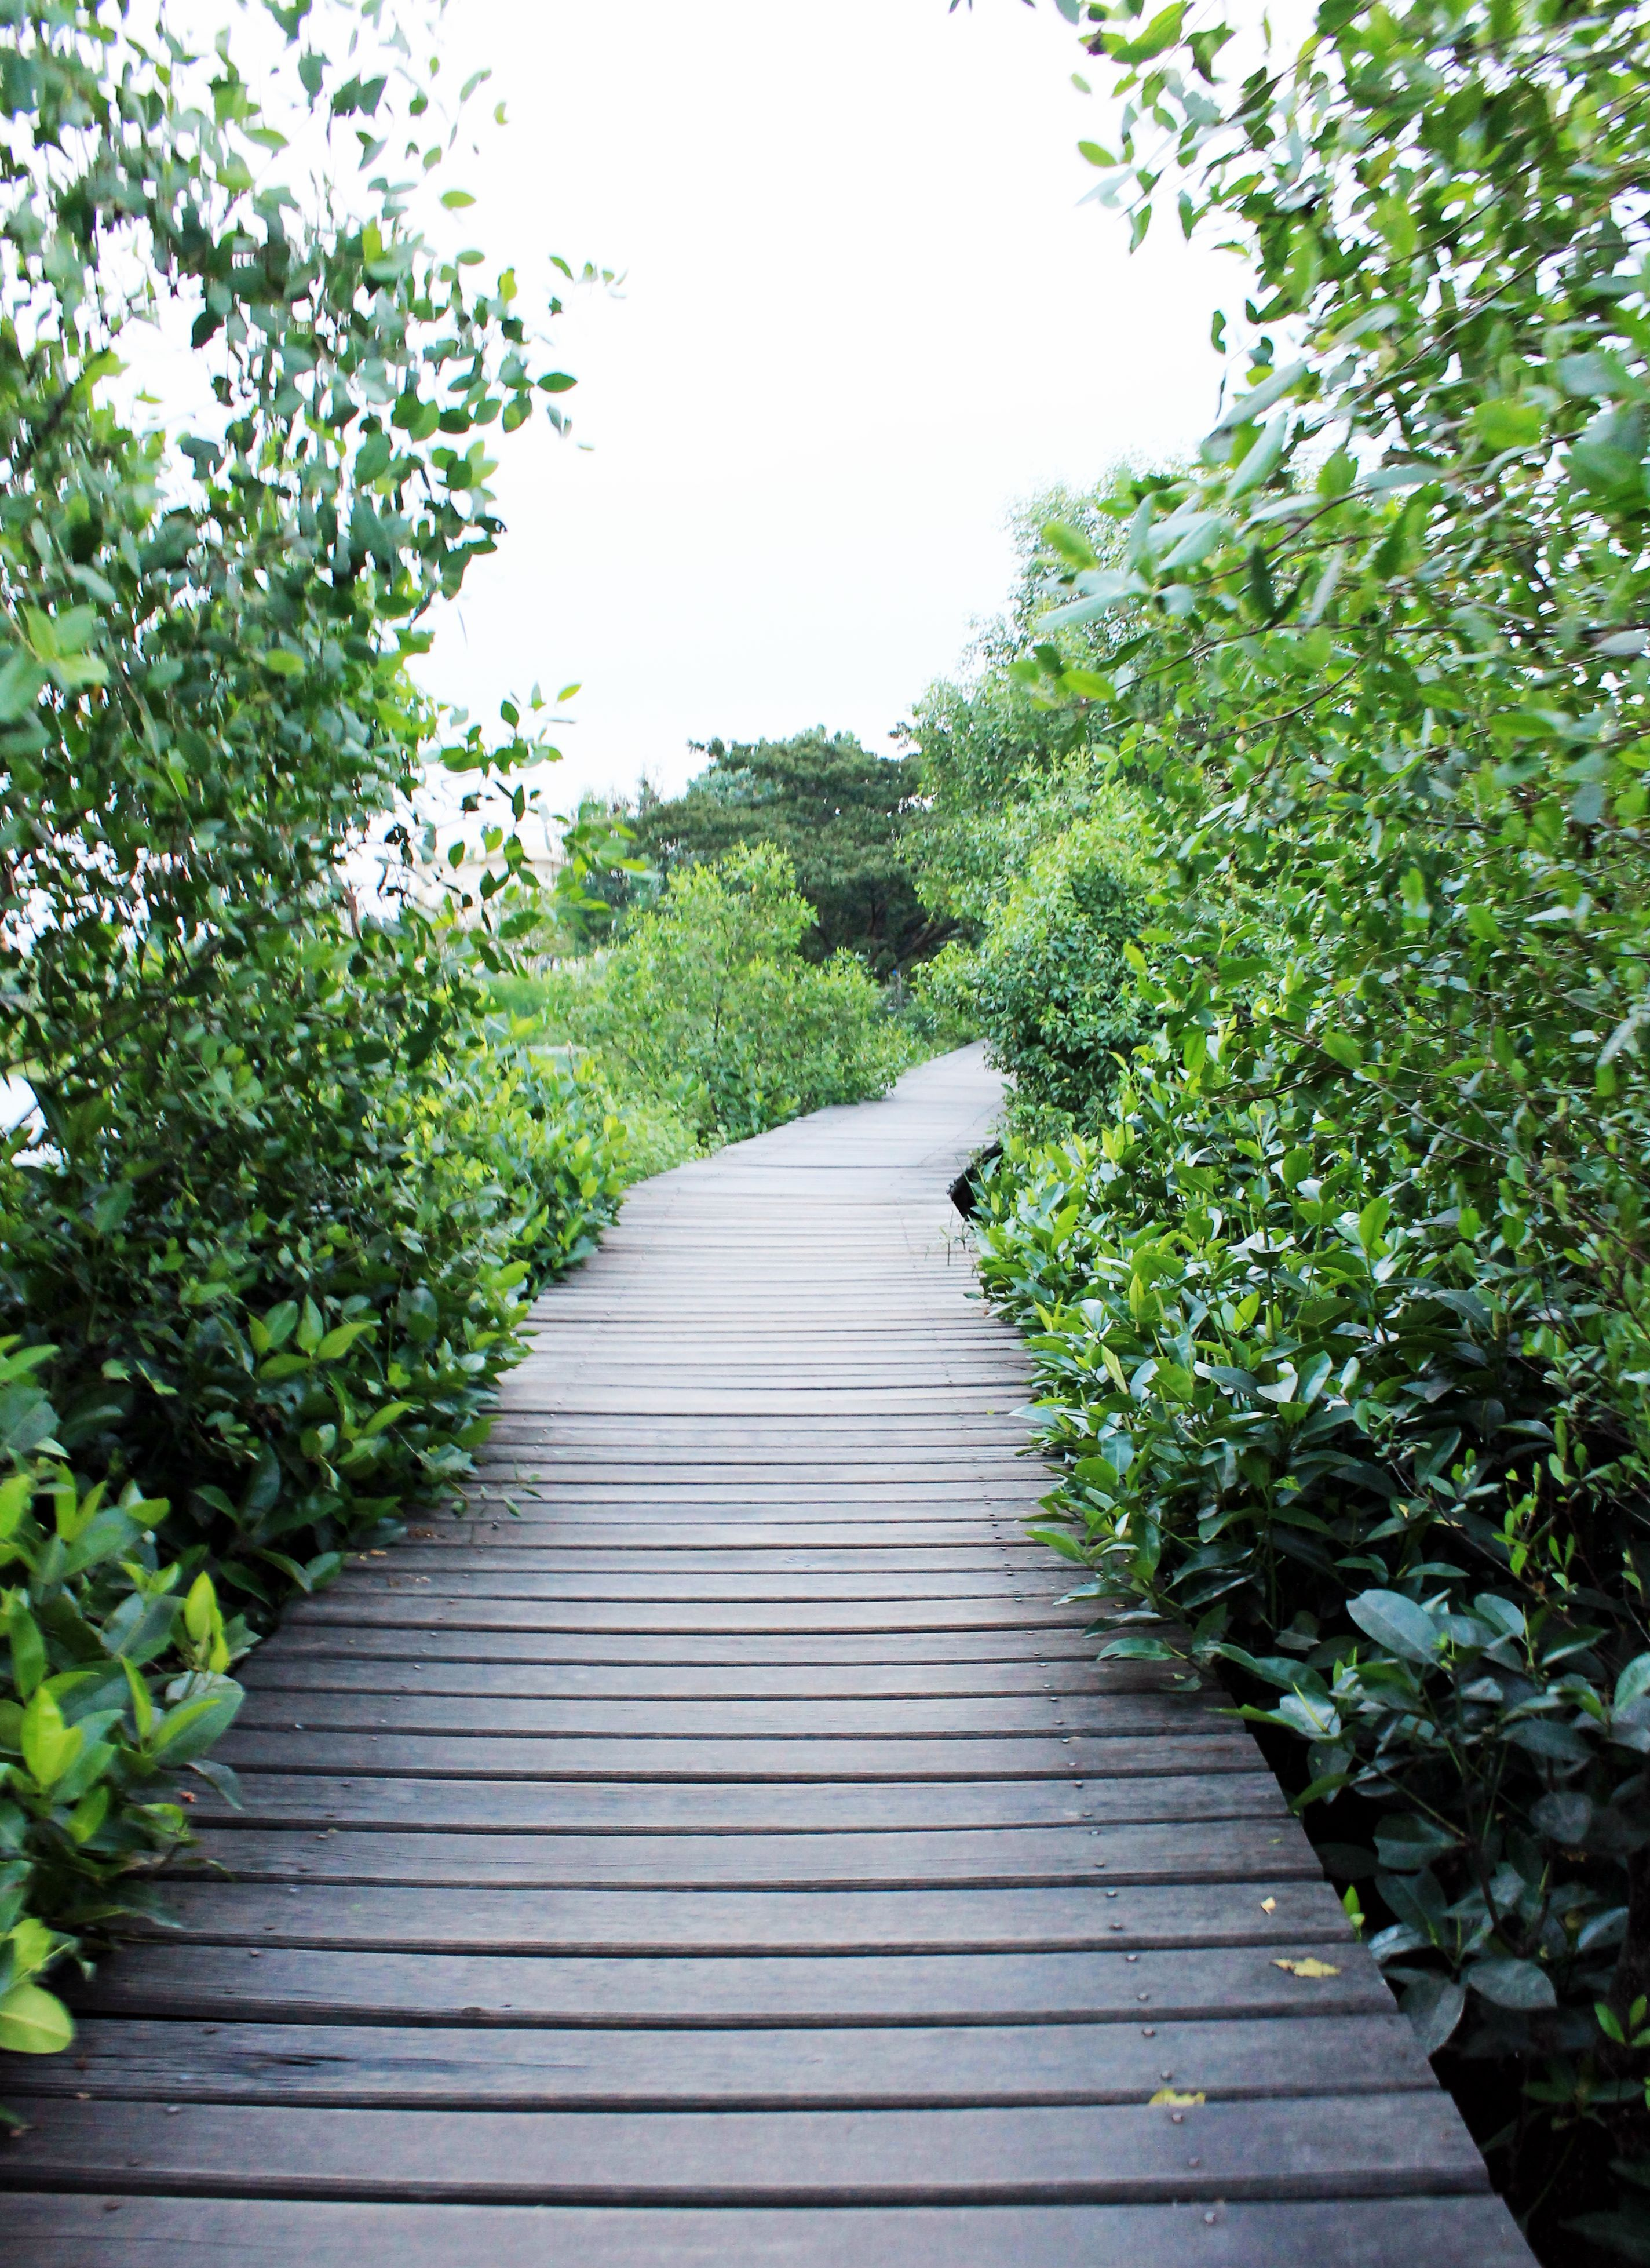 Wisata Mangrove Wonorejo Surabaya Info Hutan Terbilang Rimbun Kalian Masuk